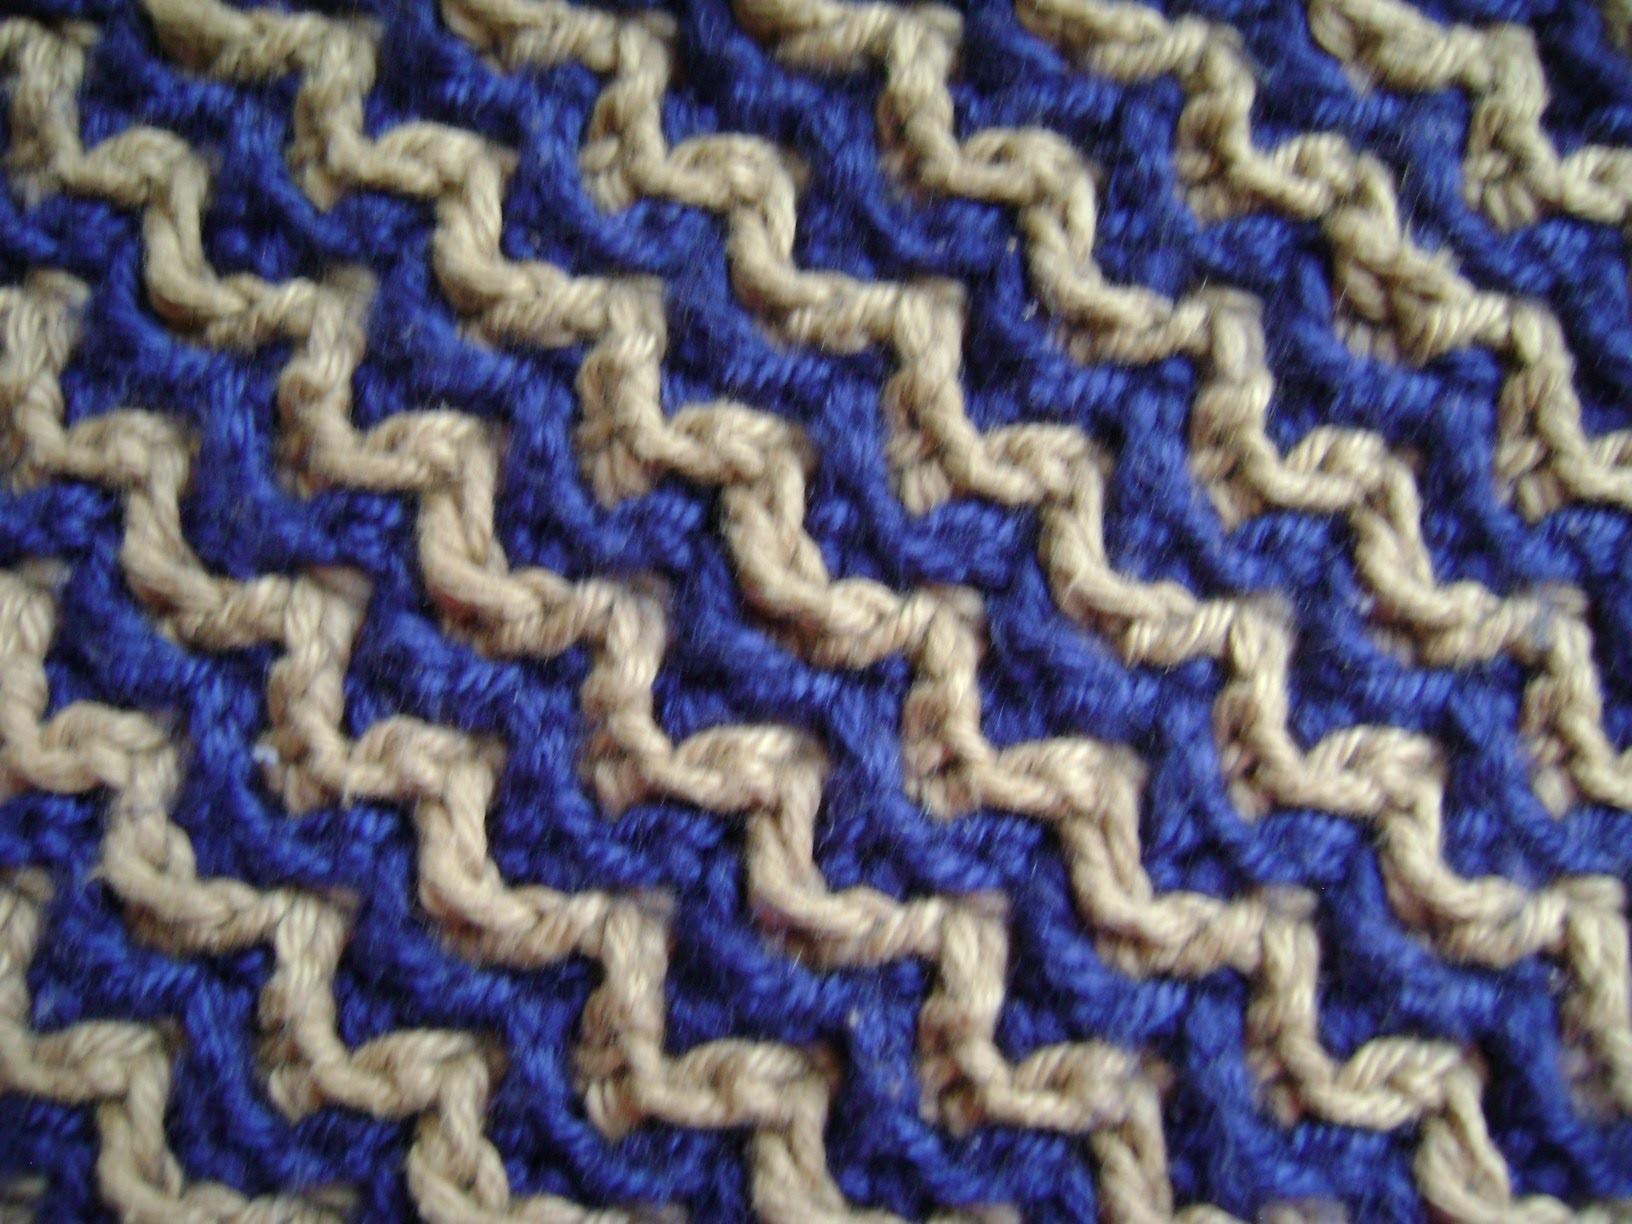 Crochet como hacer 8 puntos basicos de crochet trapillo - Puntos crochet trapillo ...